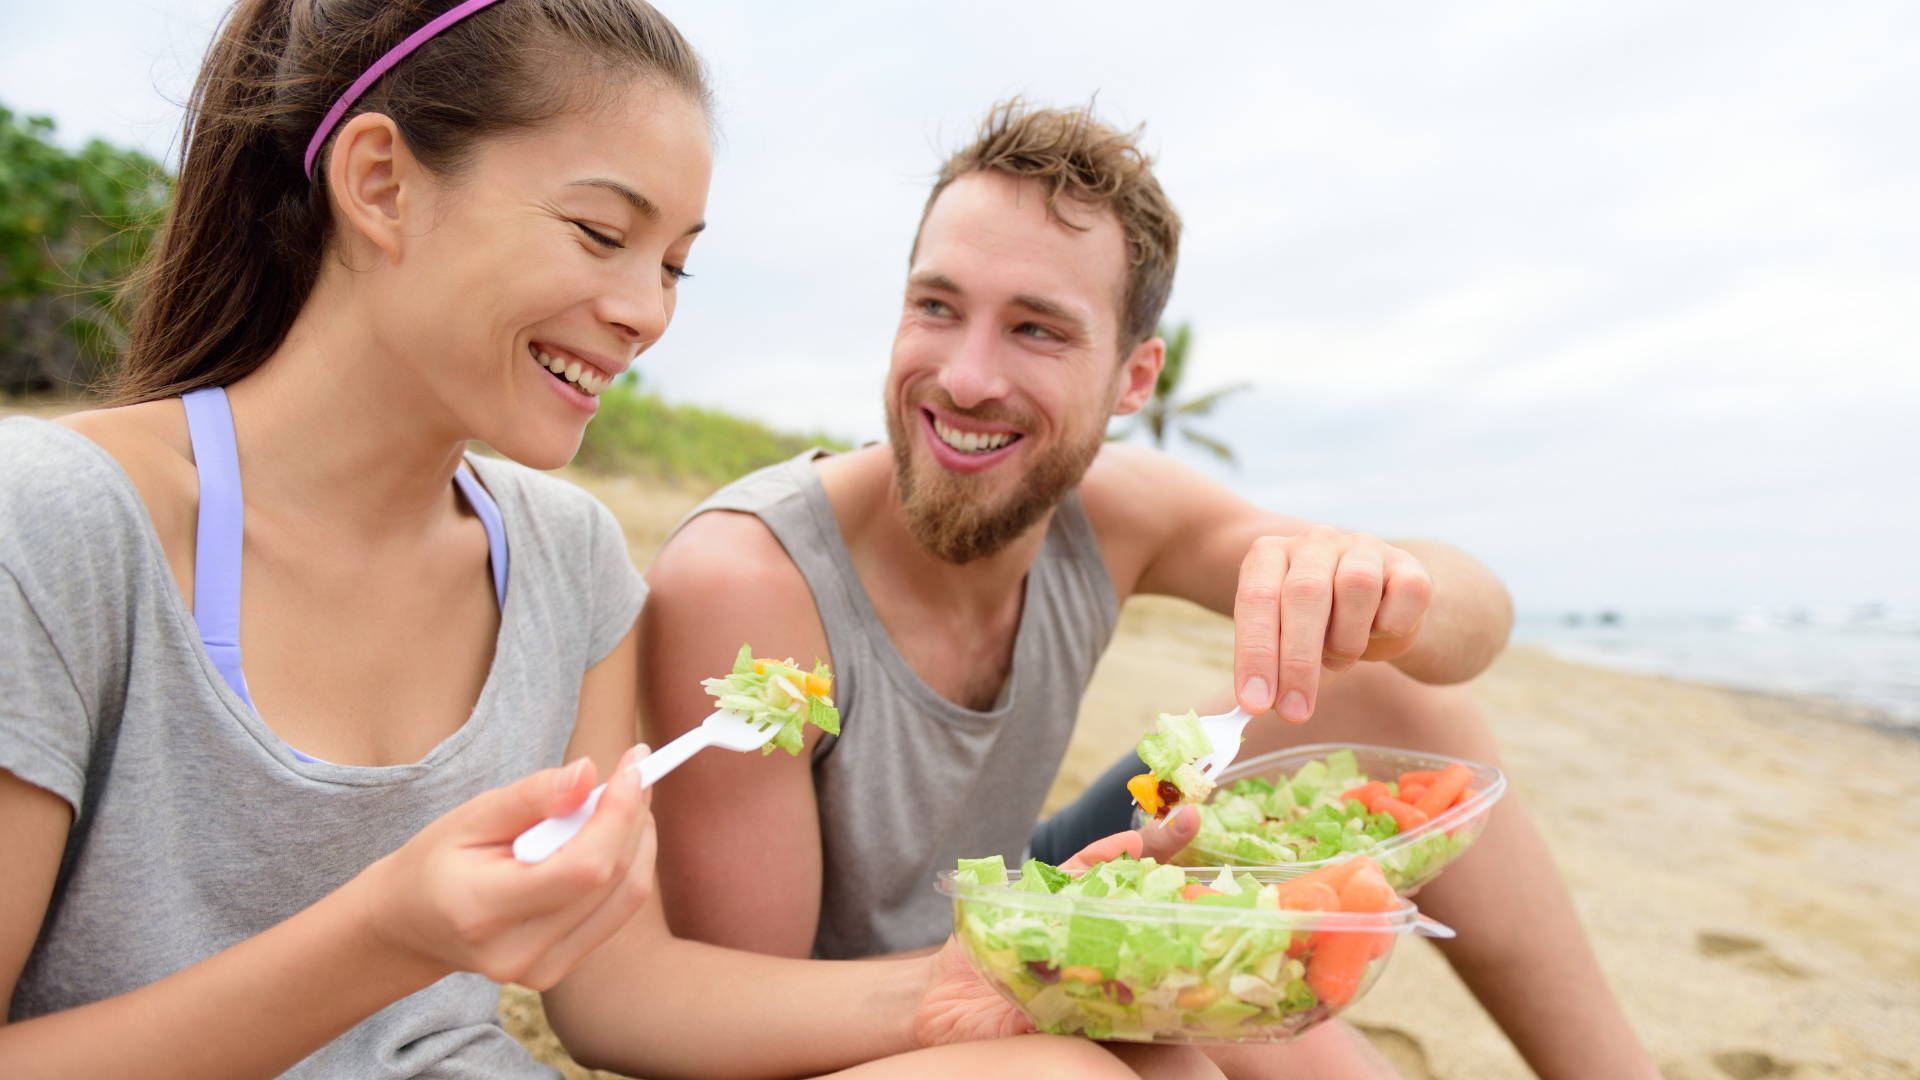 Eating Healthy Vegetable In The Beach